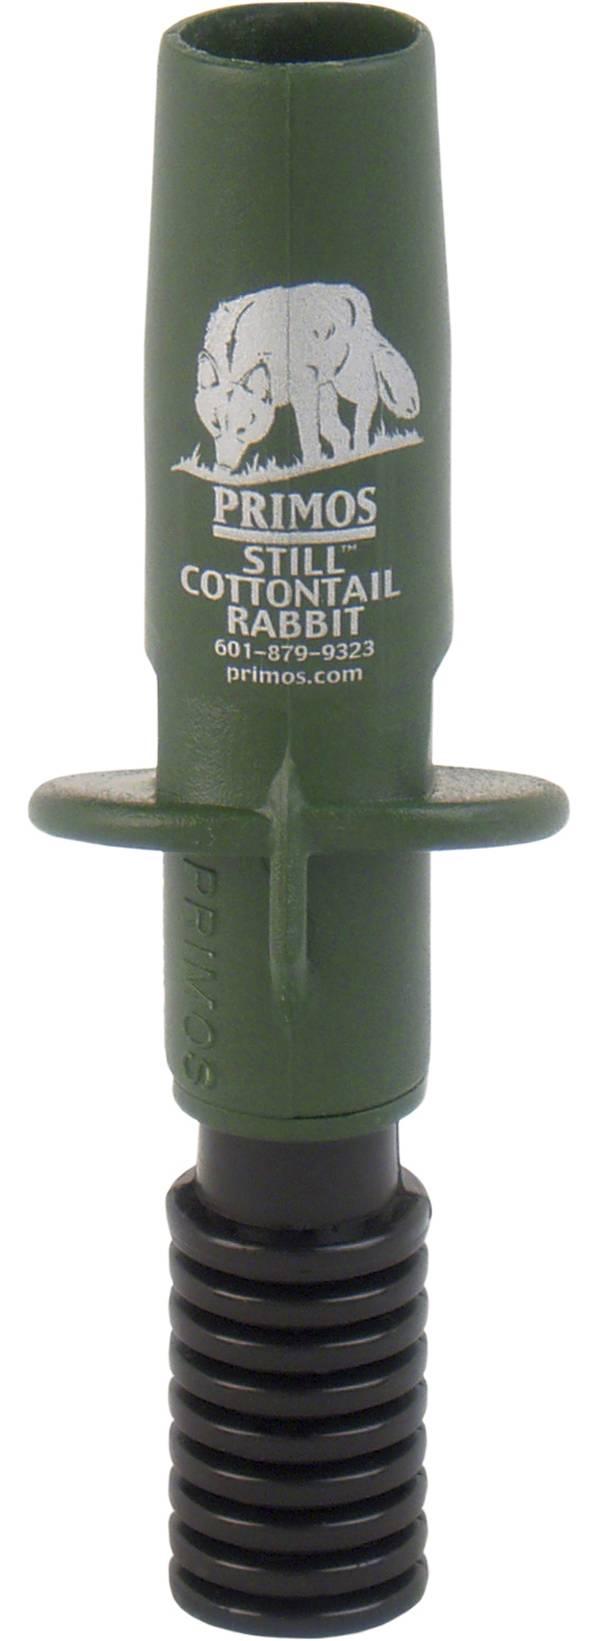 Primos Still Cottontail Rabbit Predator Call product image